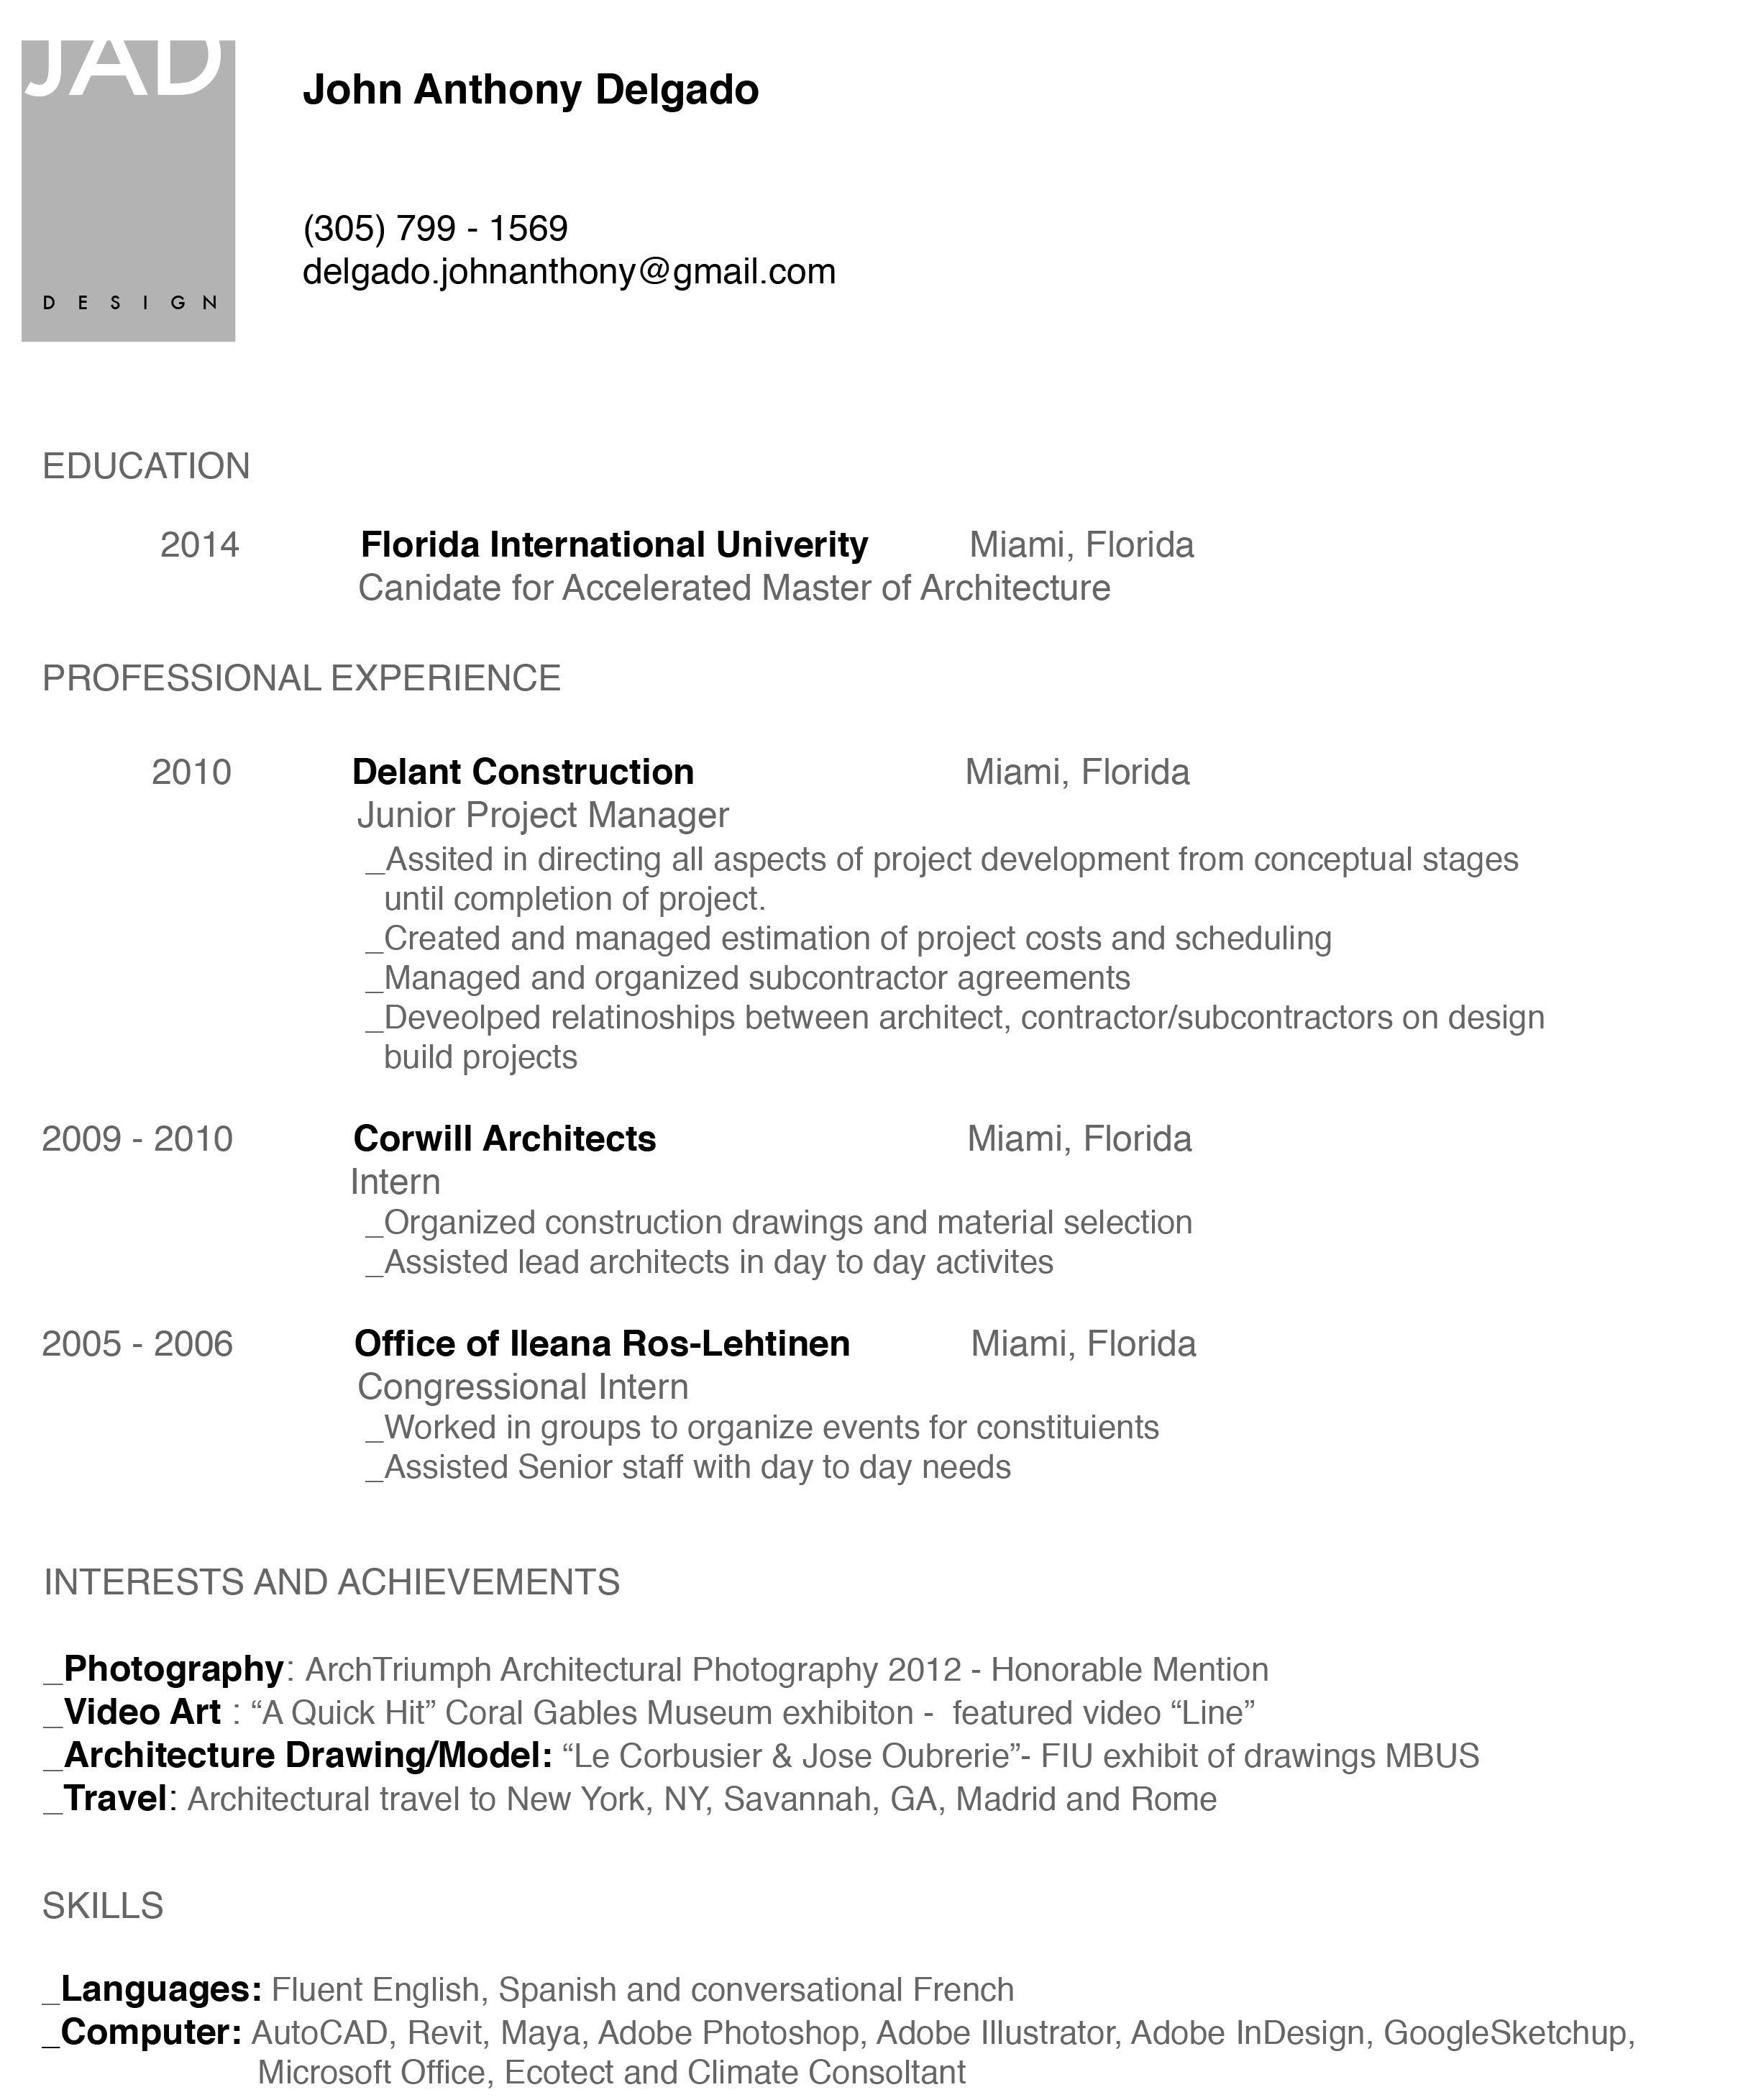 Fall 2013 Curriculum Vitae Curriculum Vitae Curriculum Education